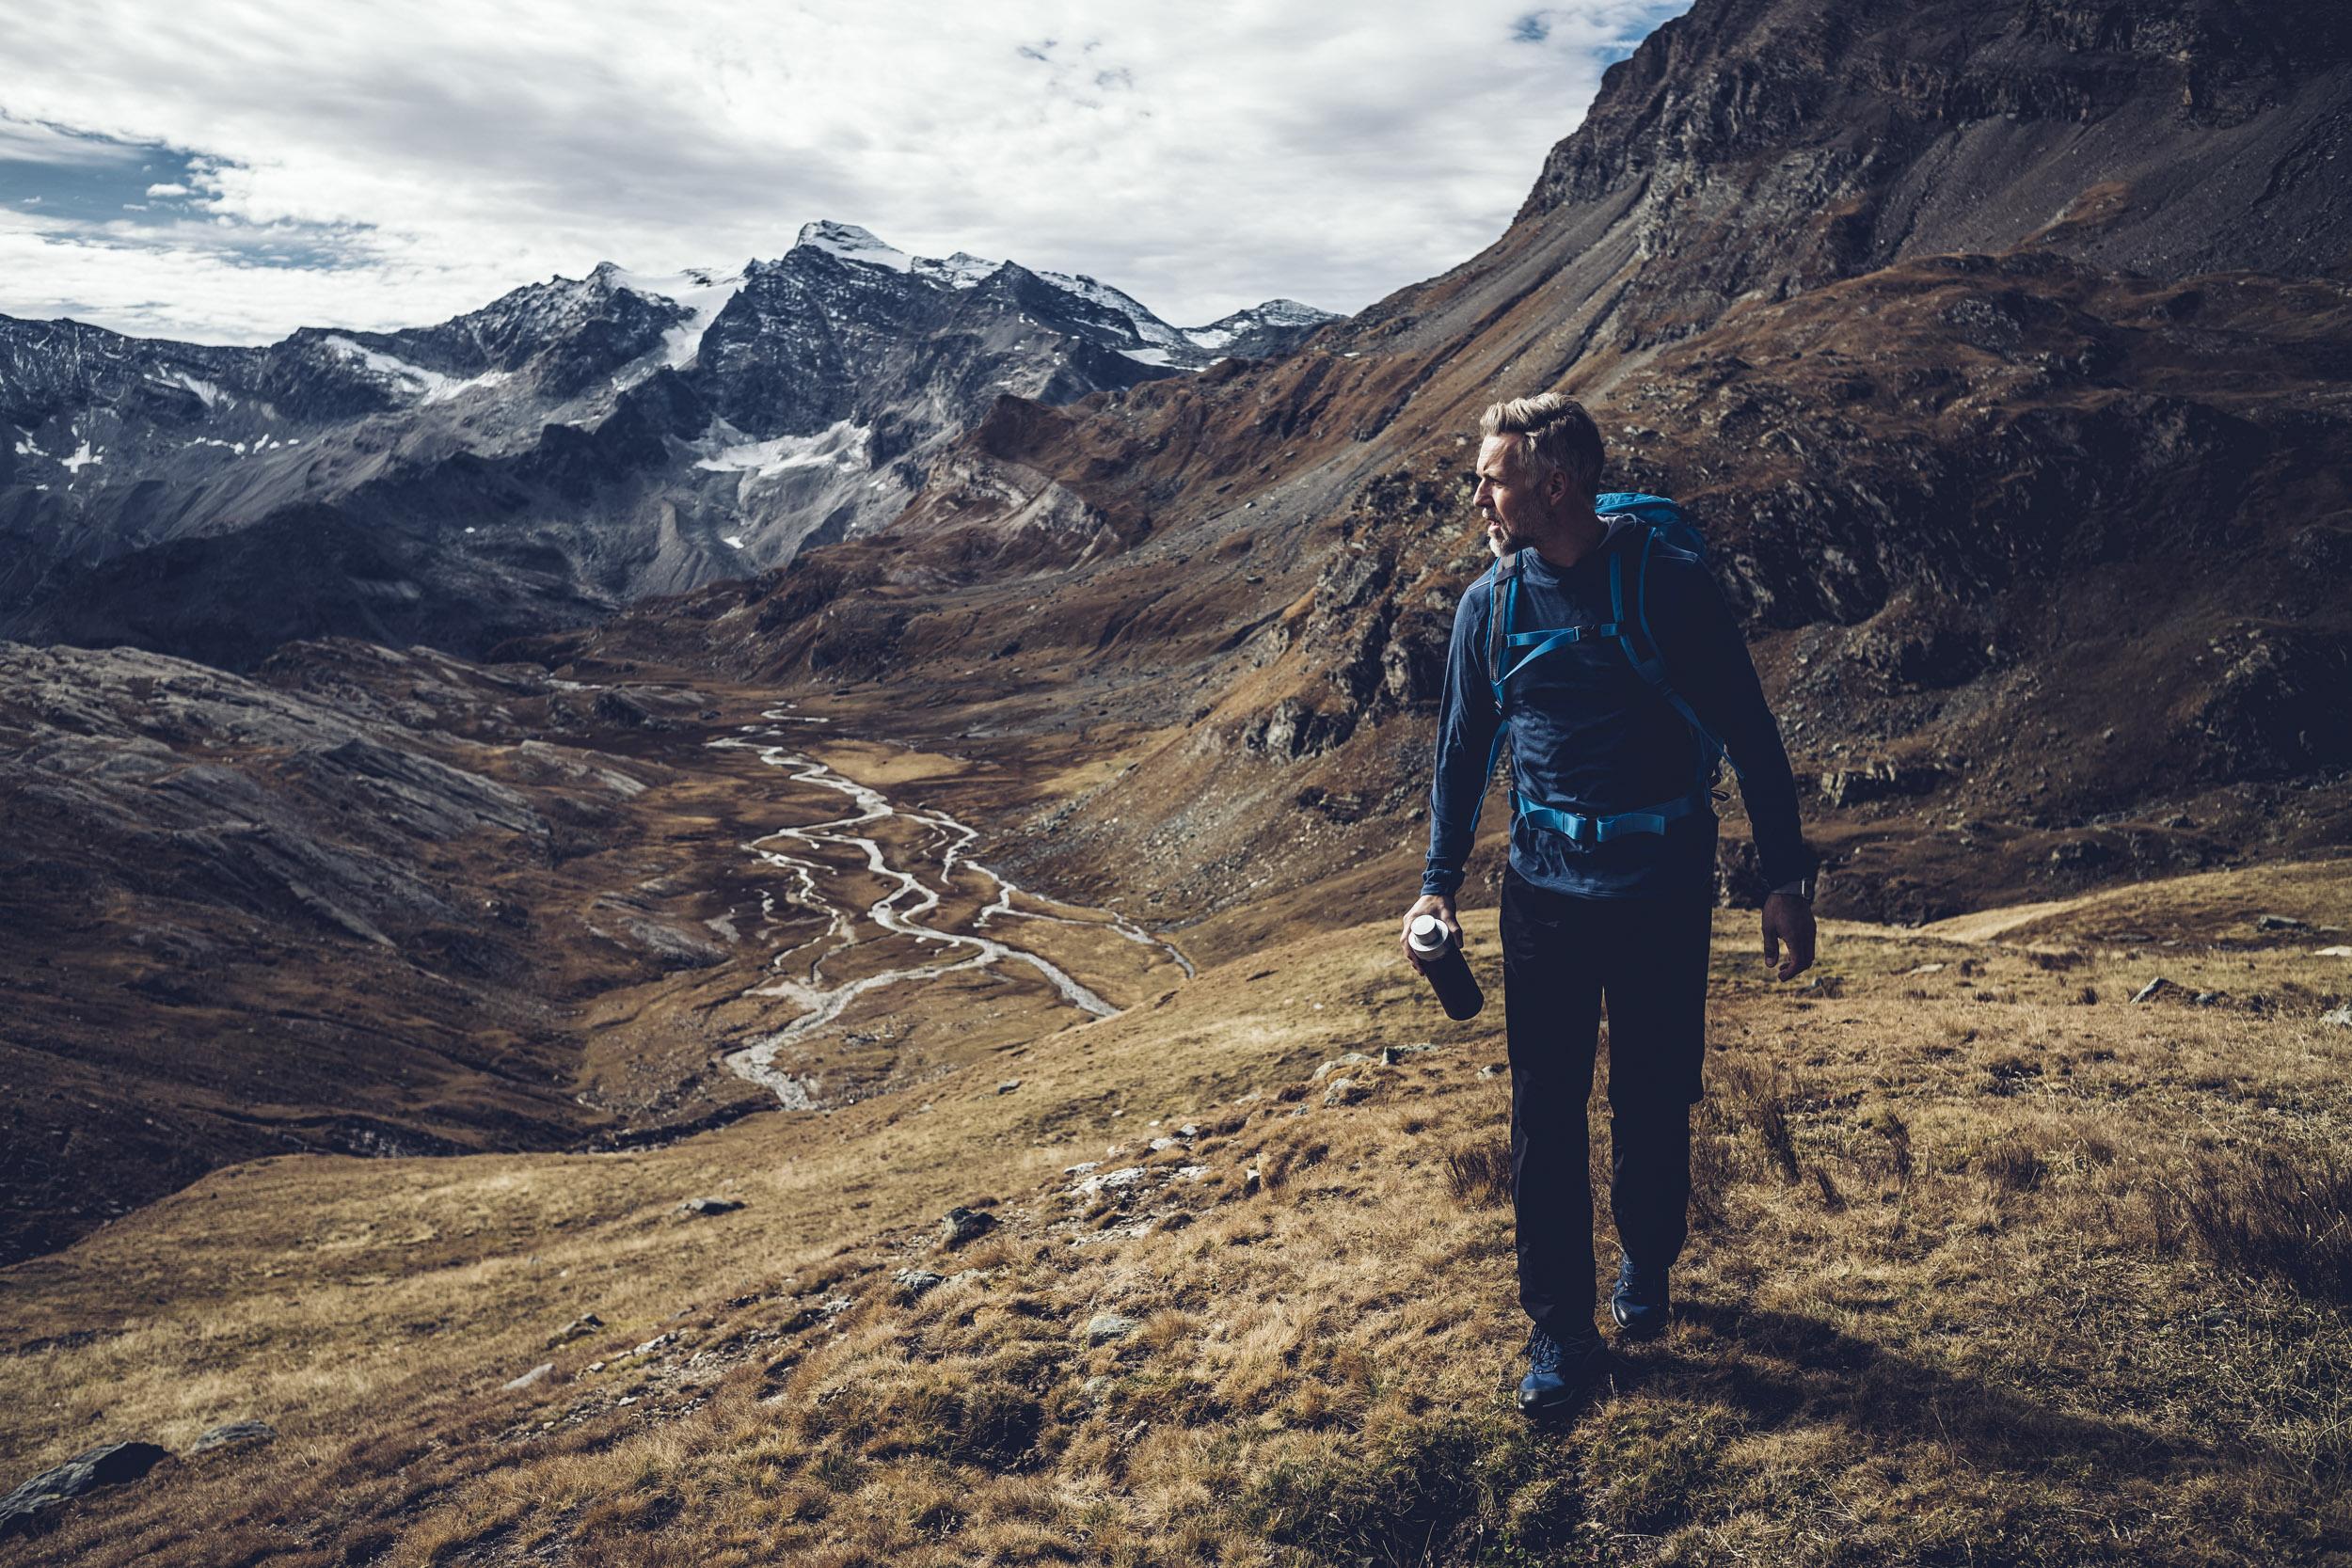 2019-SeifertUebler-luqel-outdoor-mountain-lifestyle001.jpg